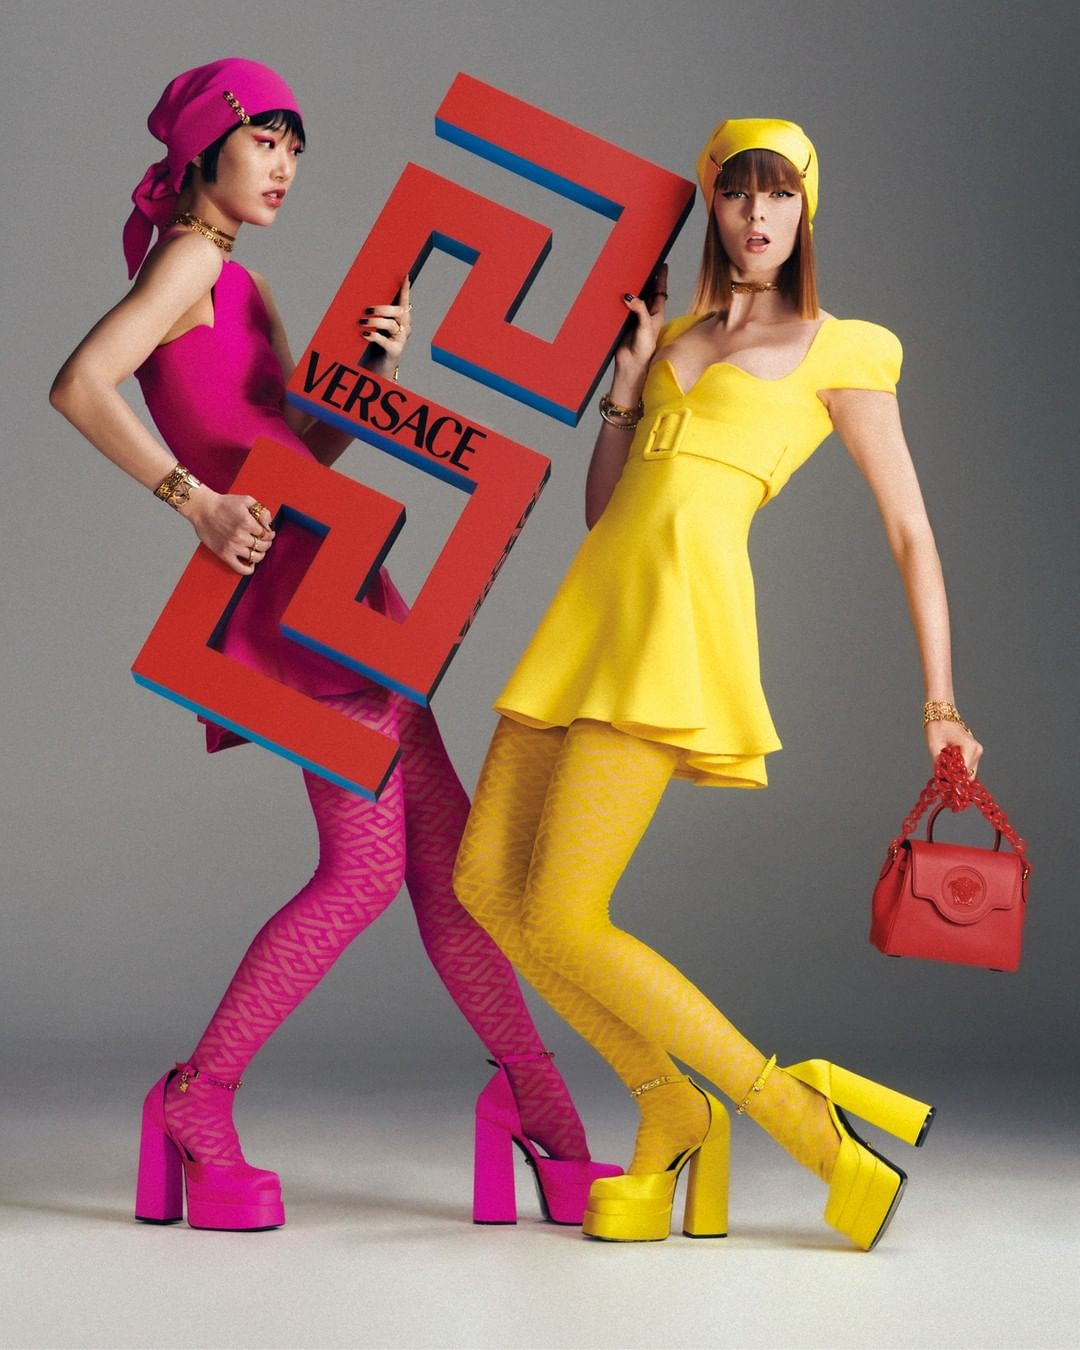 tendenze moda anni 60 Life&People Magazine LifeandPeople.it